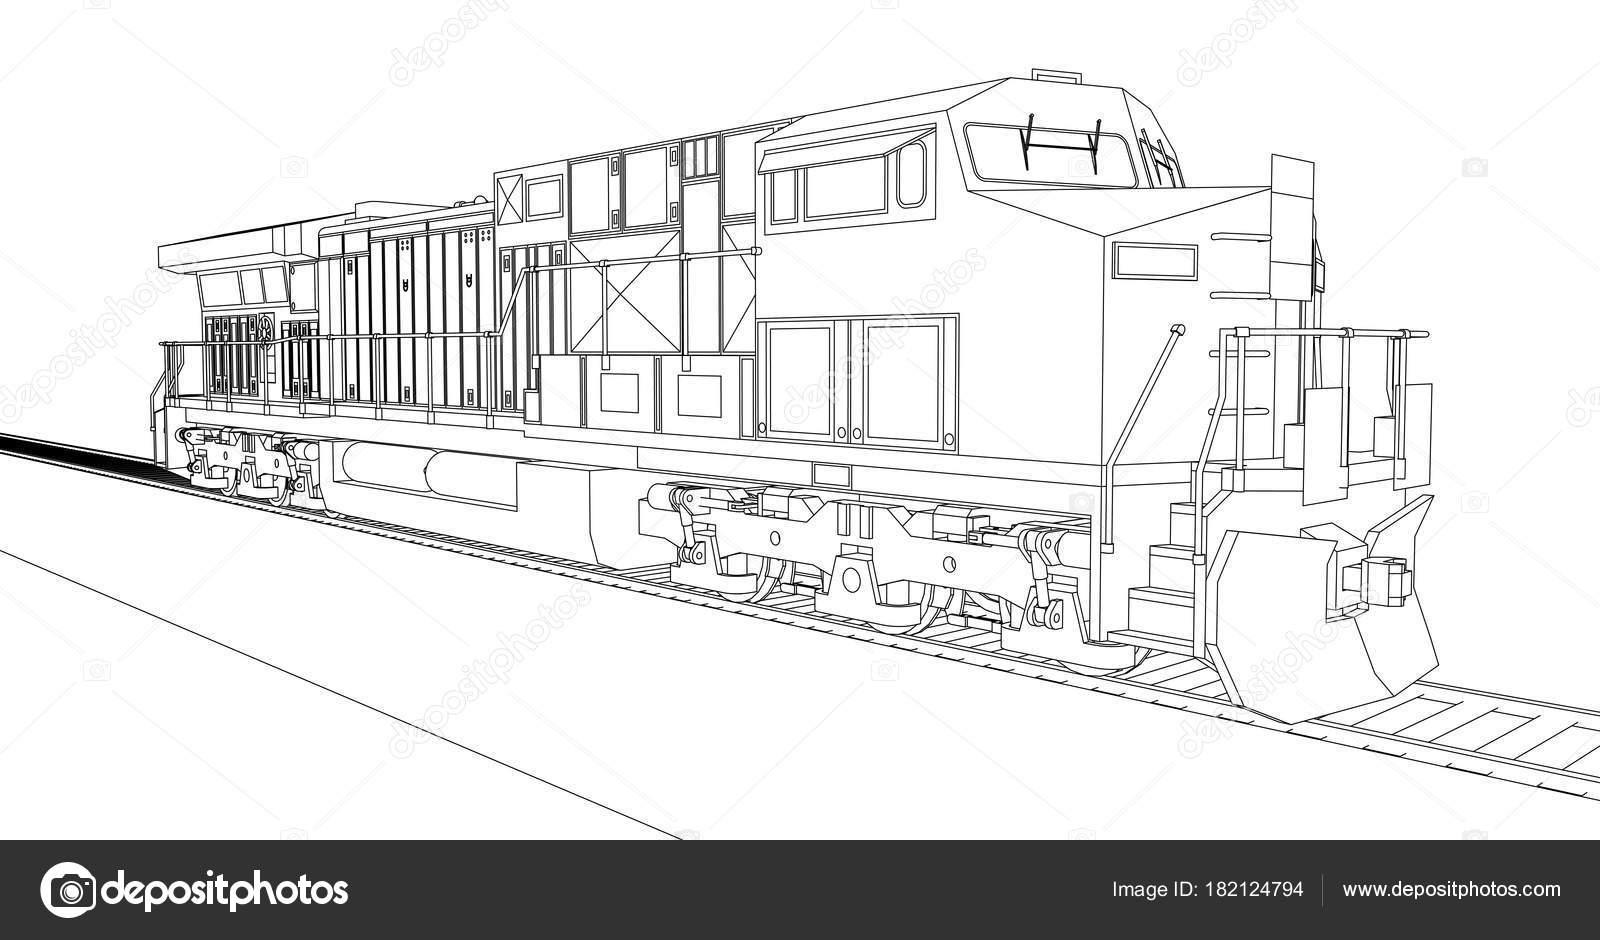 Modern diesel railway locomotive with great power and strength for modern diesel railway locomotive with great power and strength for moving long and heavy railroad train malvernweather Gallery